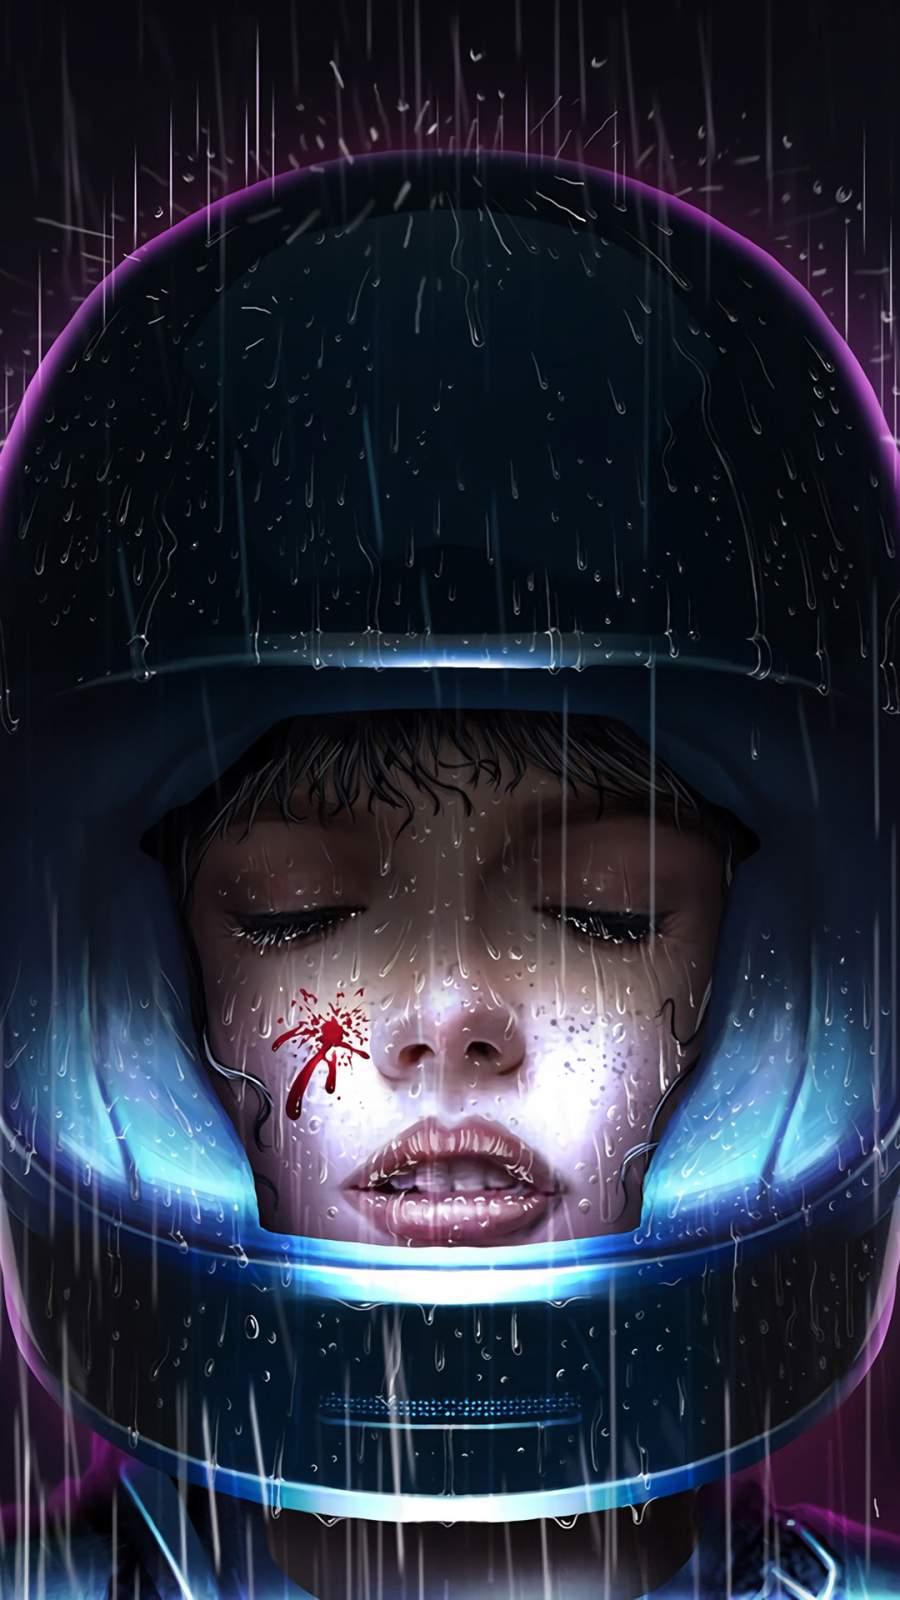 Cyberpunk Helmet Closed Eyes iPhone Wallpaper